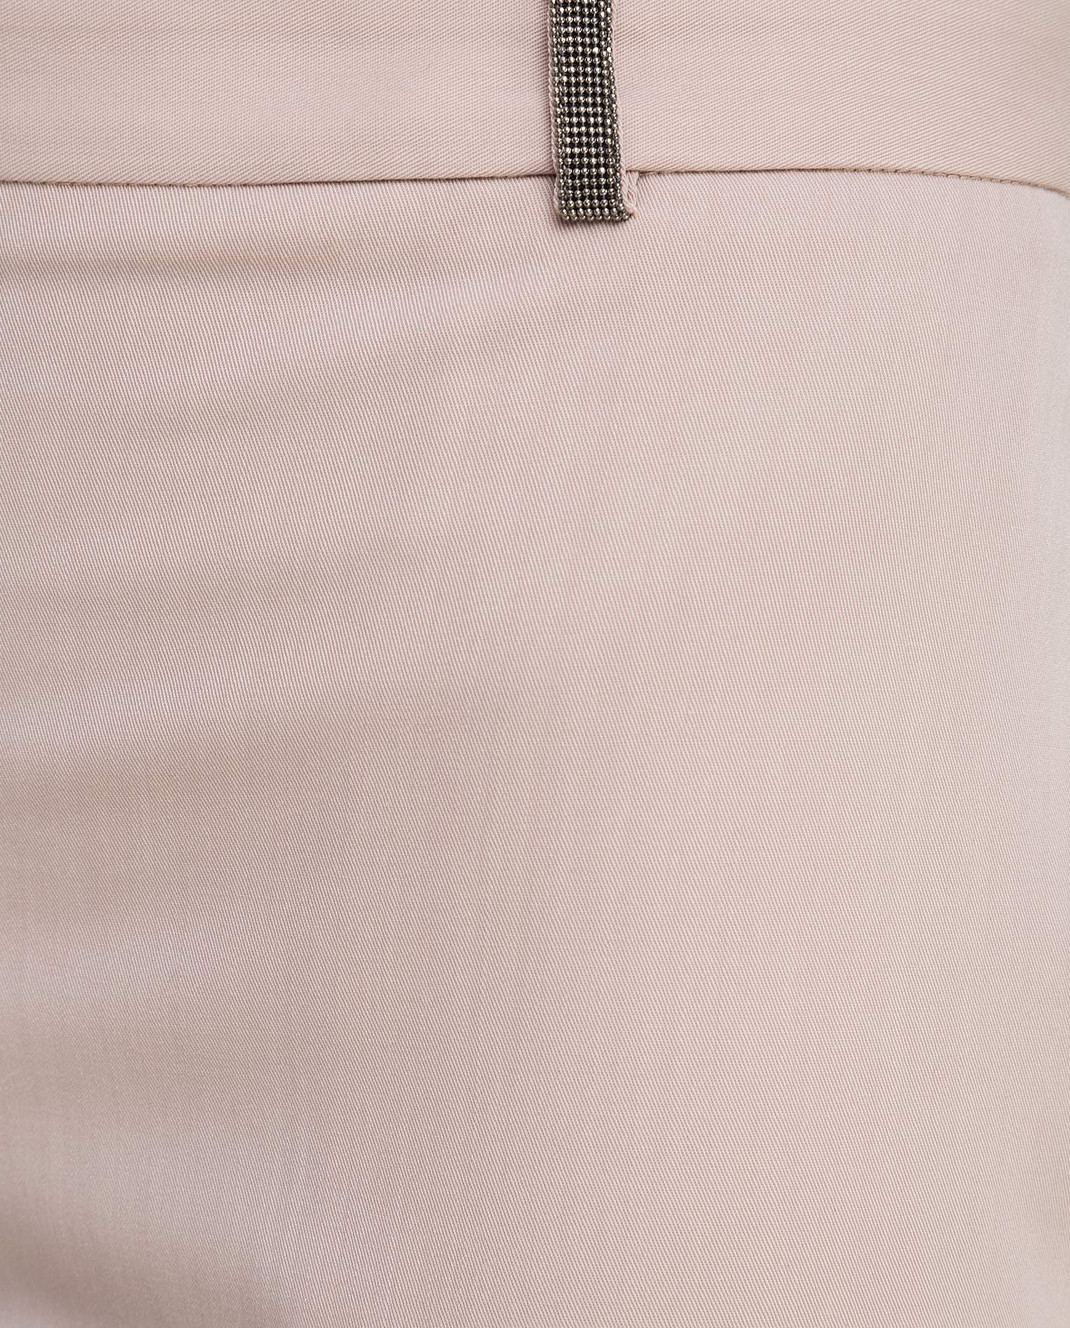 Fabiana Filippi Бежевые брюки из шерсти изображение 5